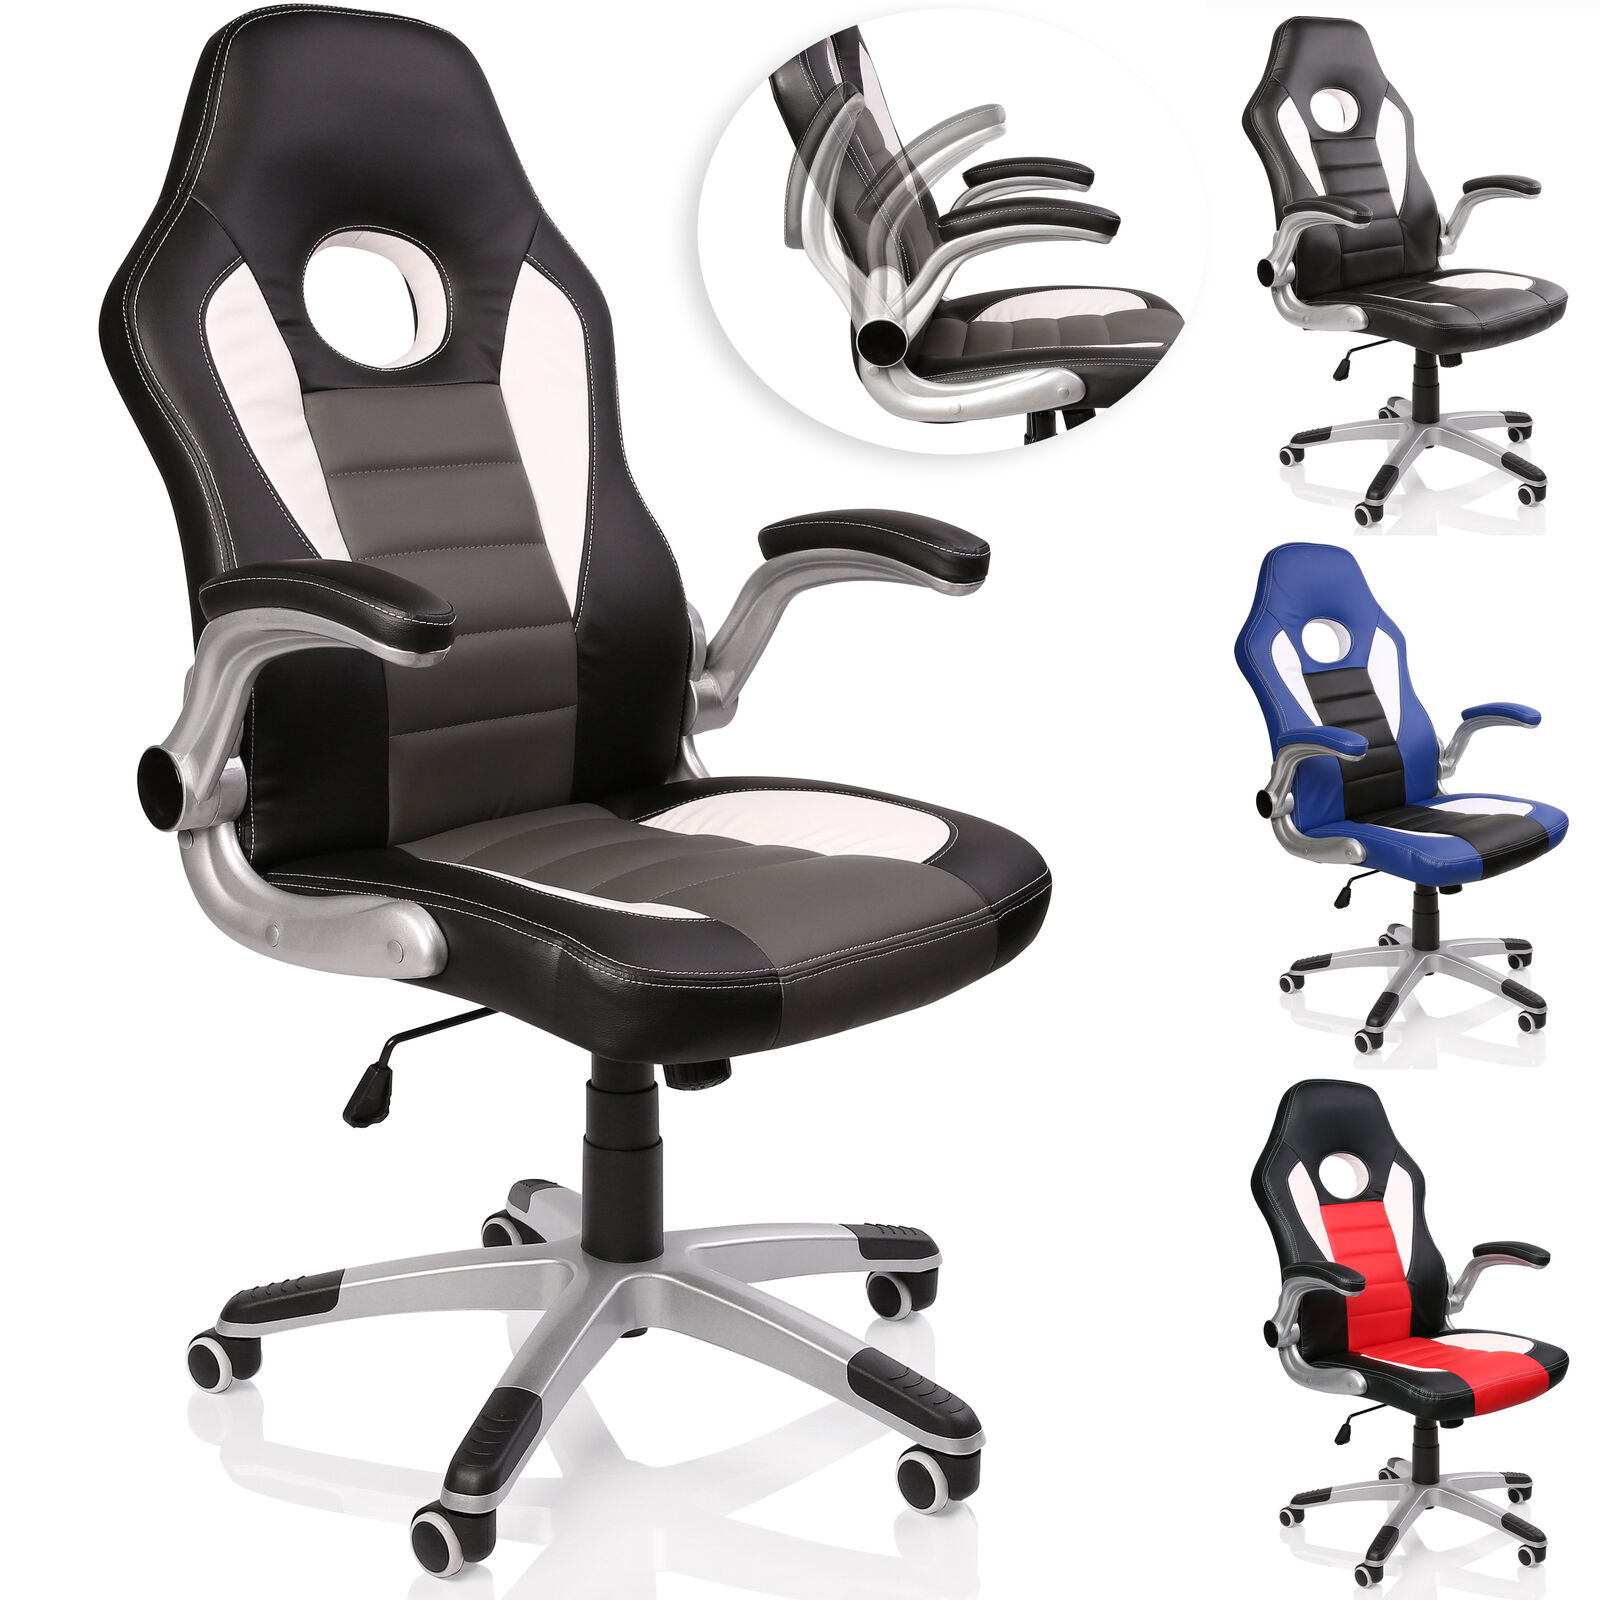 Racing Chefsessel Bürostuhl Drehstuhl Sportsitz Bürosessel Schreibtischstuhl